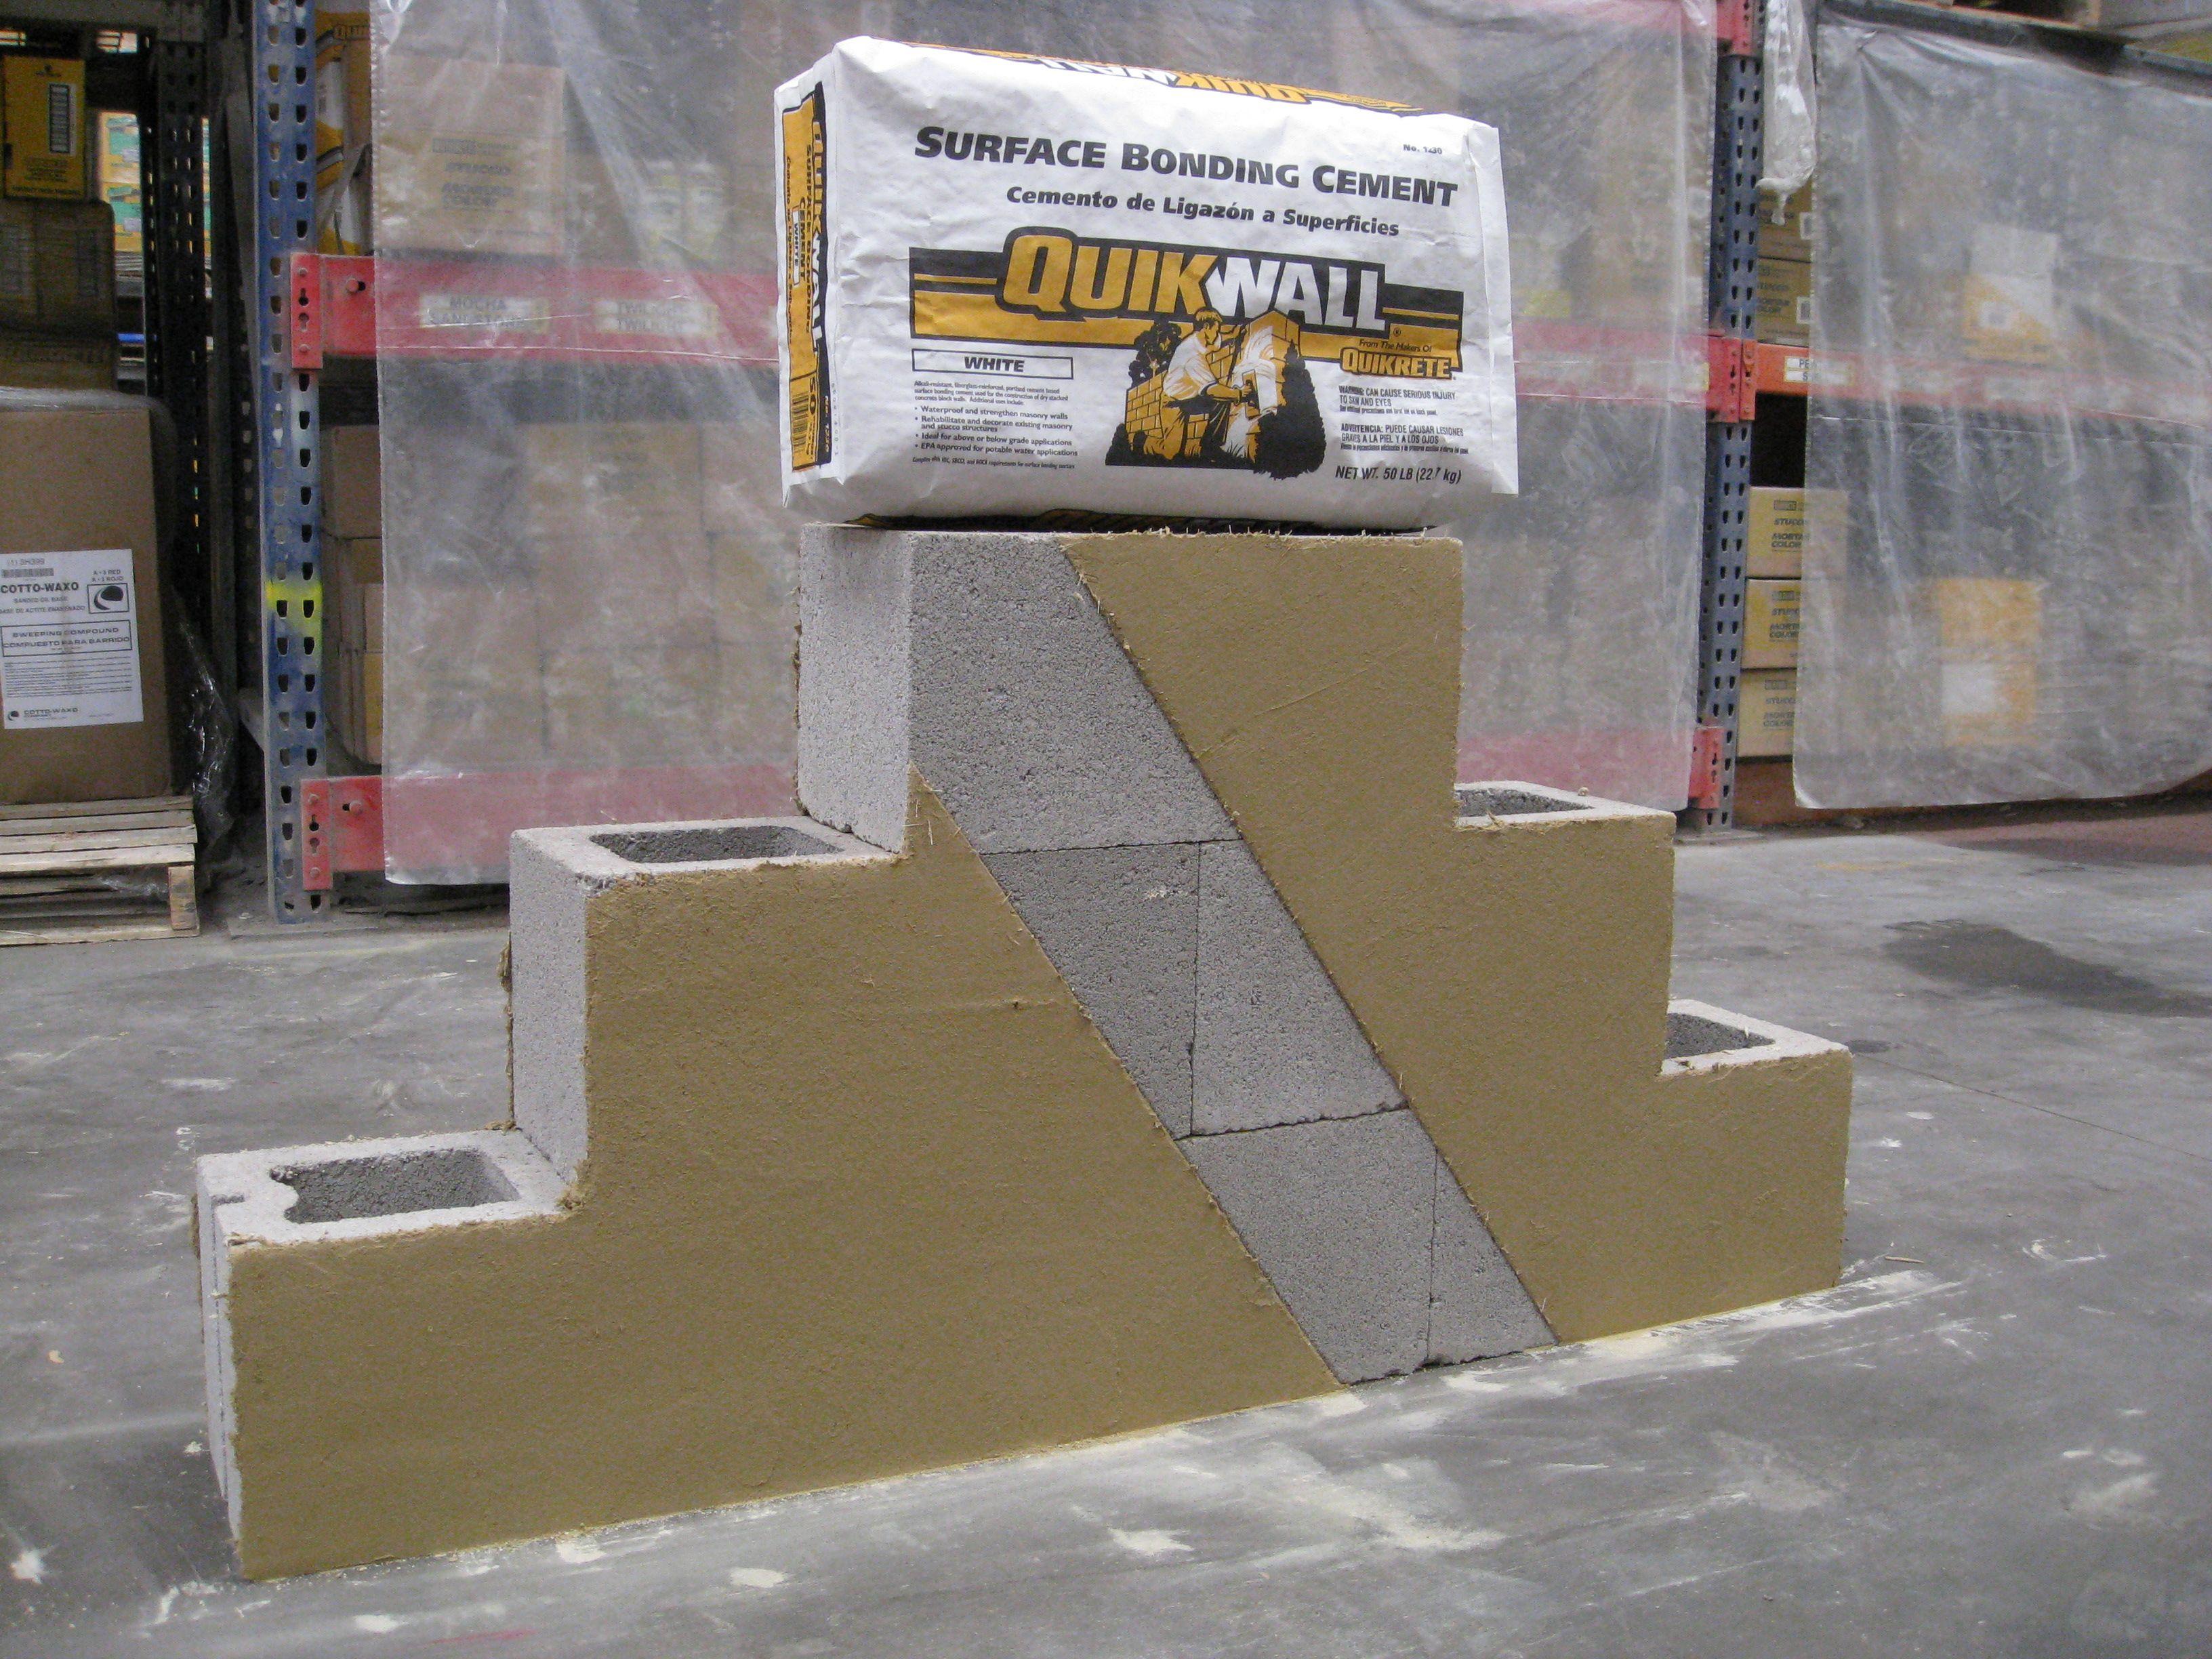 How To Build An Easy Block Garden Retaining Wall Without Mortar Concrete Block Wall Garden Retaining Wall